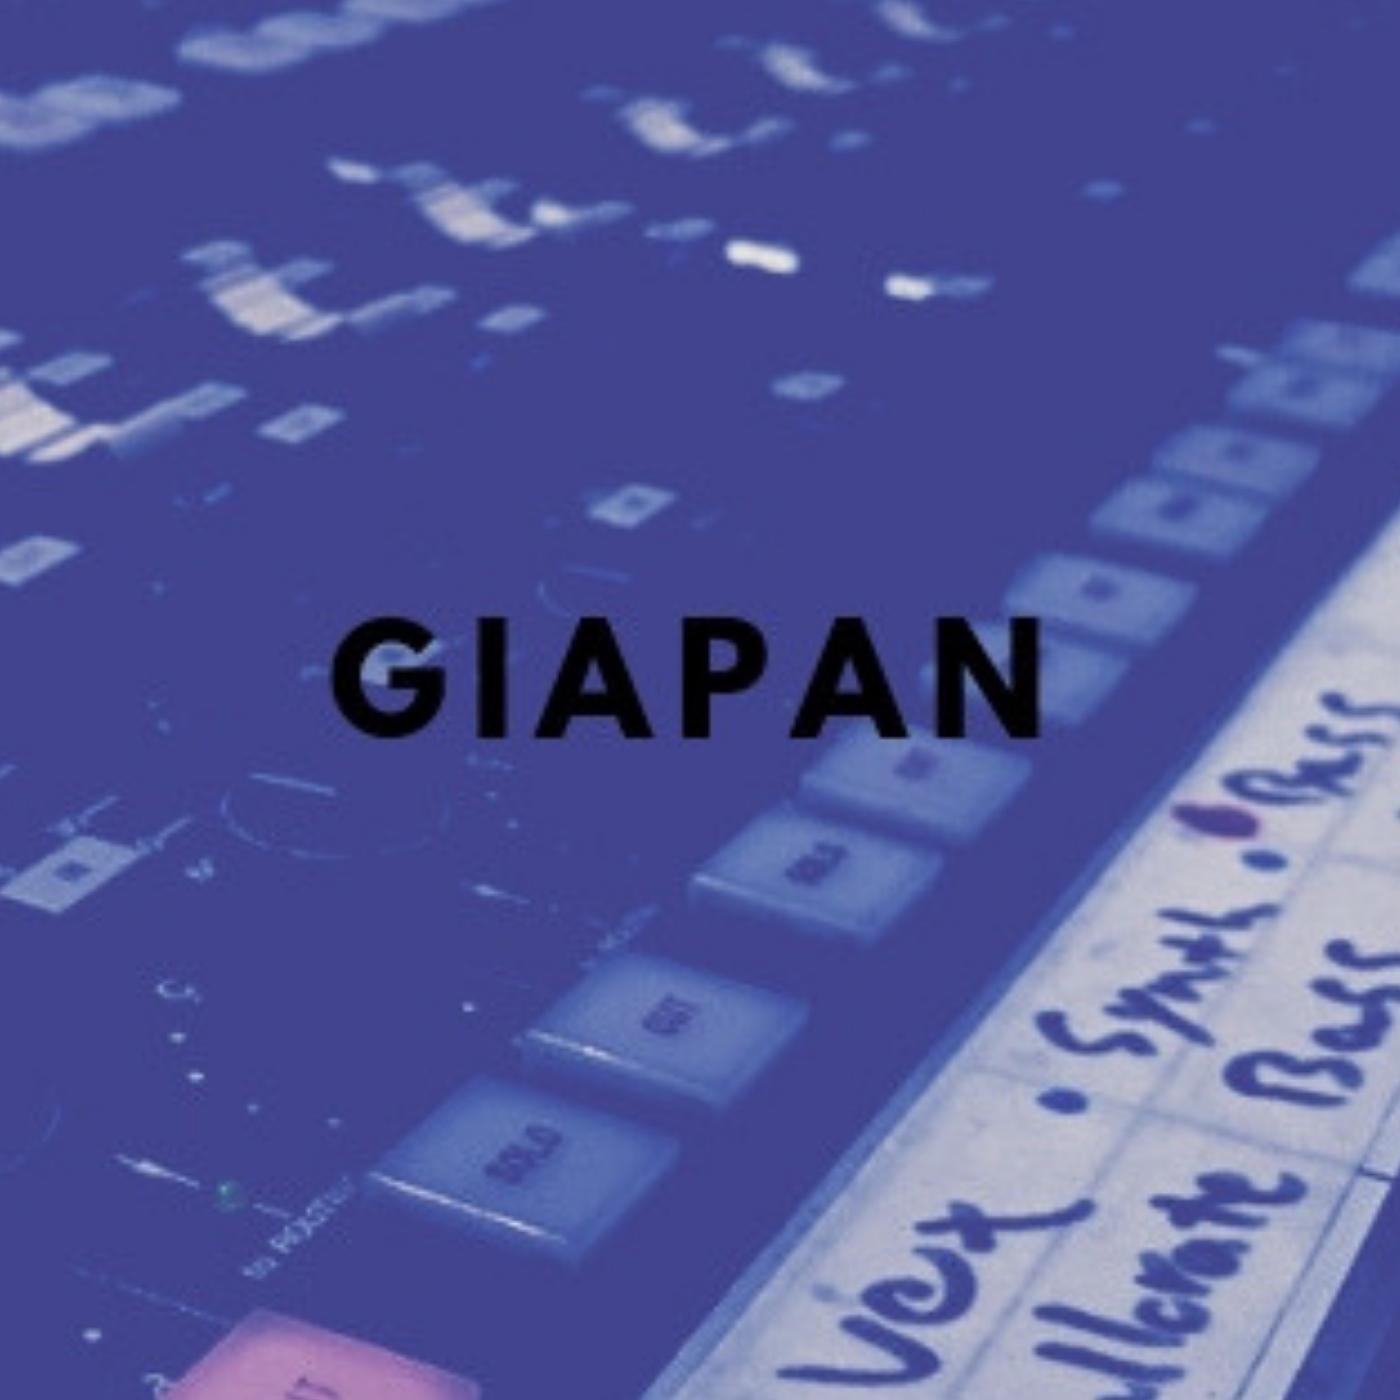 Giapan Profile Photo.jpg